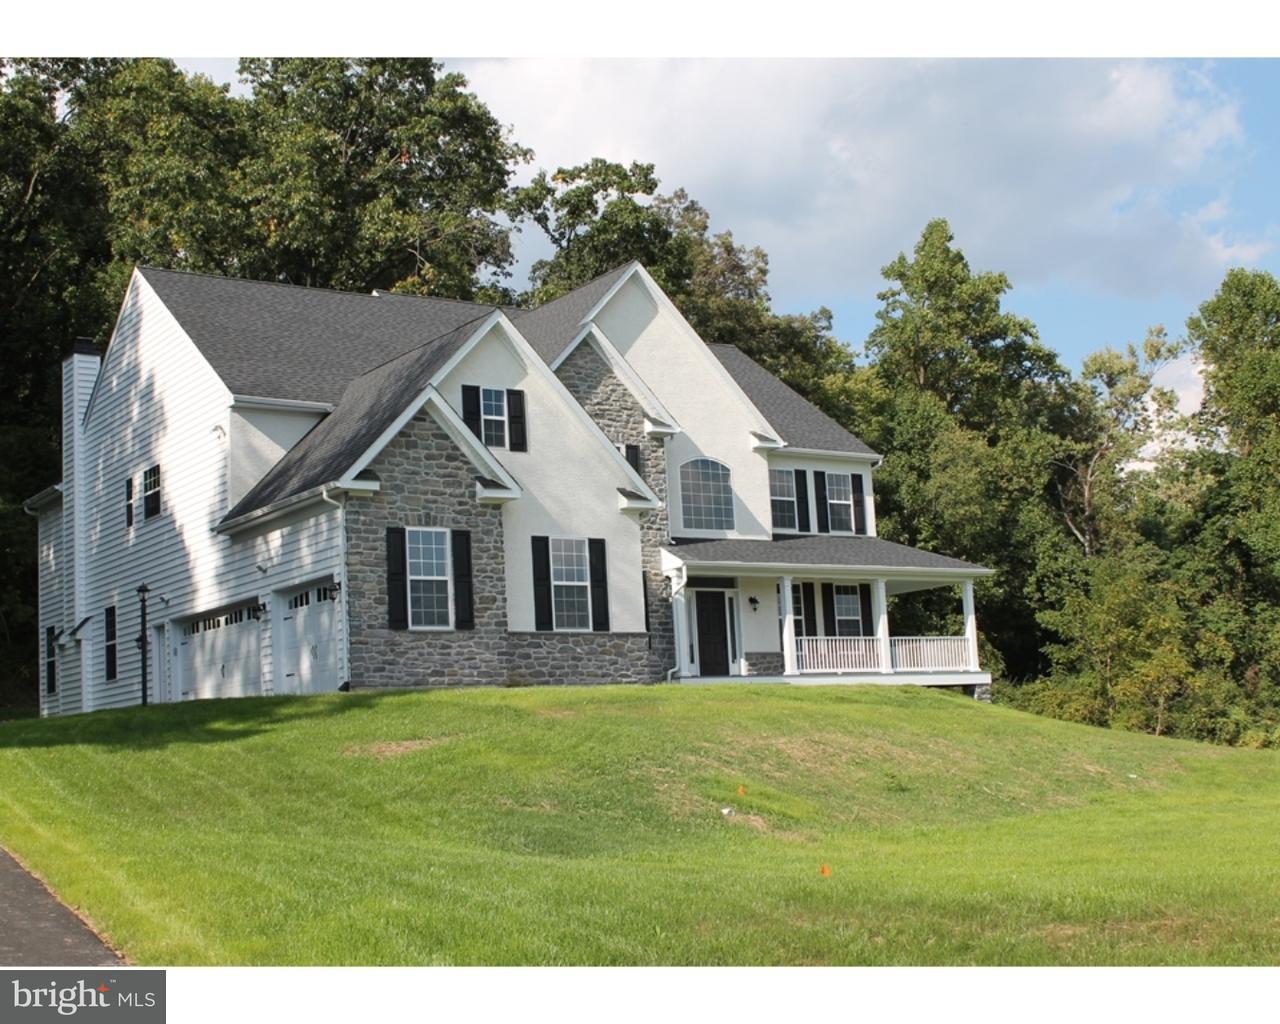 11-5-44 EASTON RD, KINTNERSVILLE - Listed at $743,326, KINTNERSVILLE